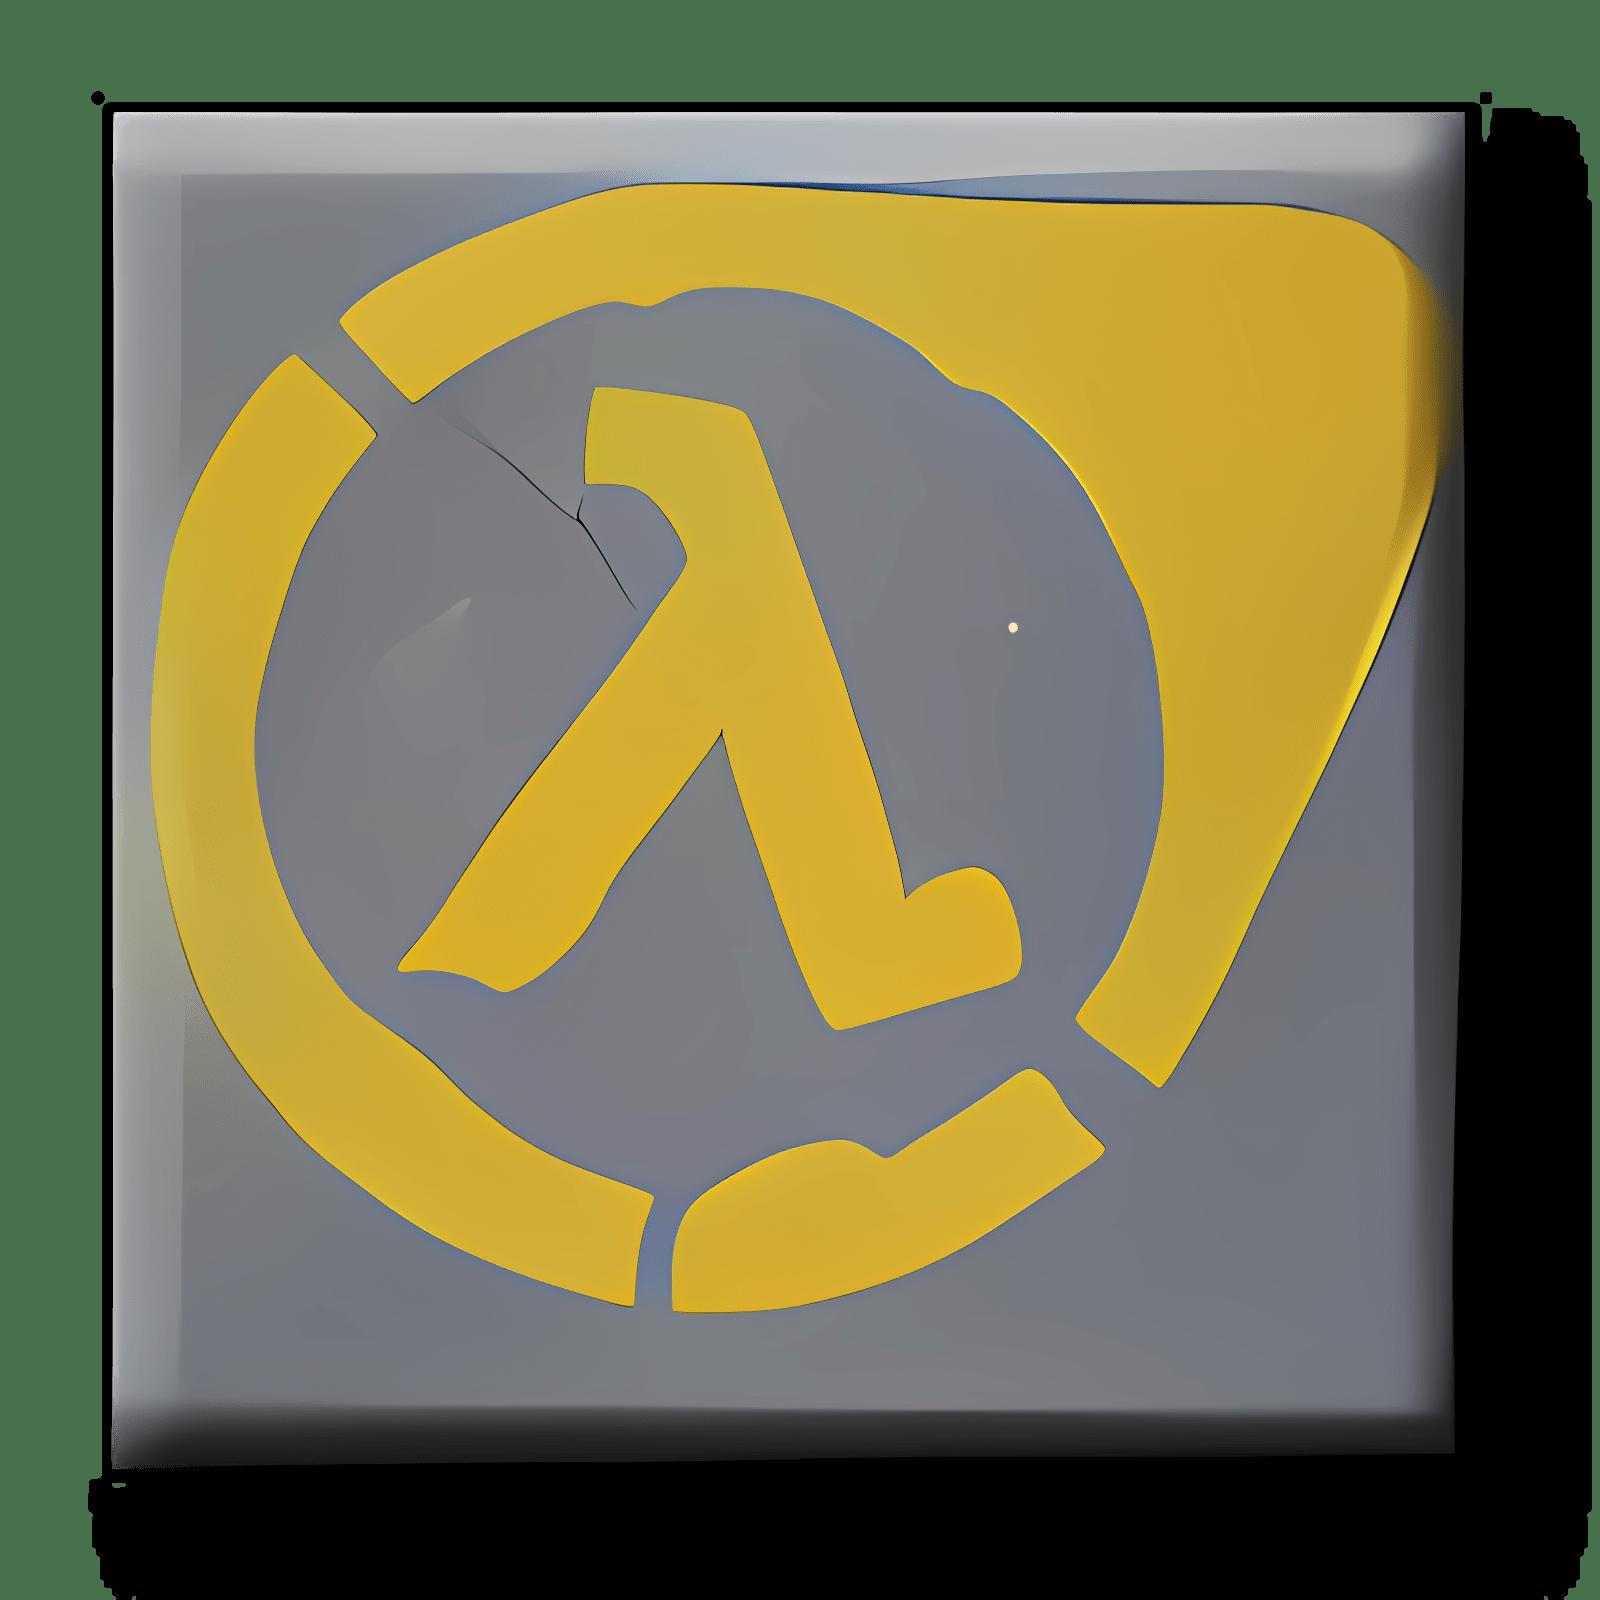 Half-Life Patch